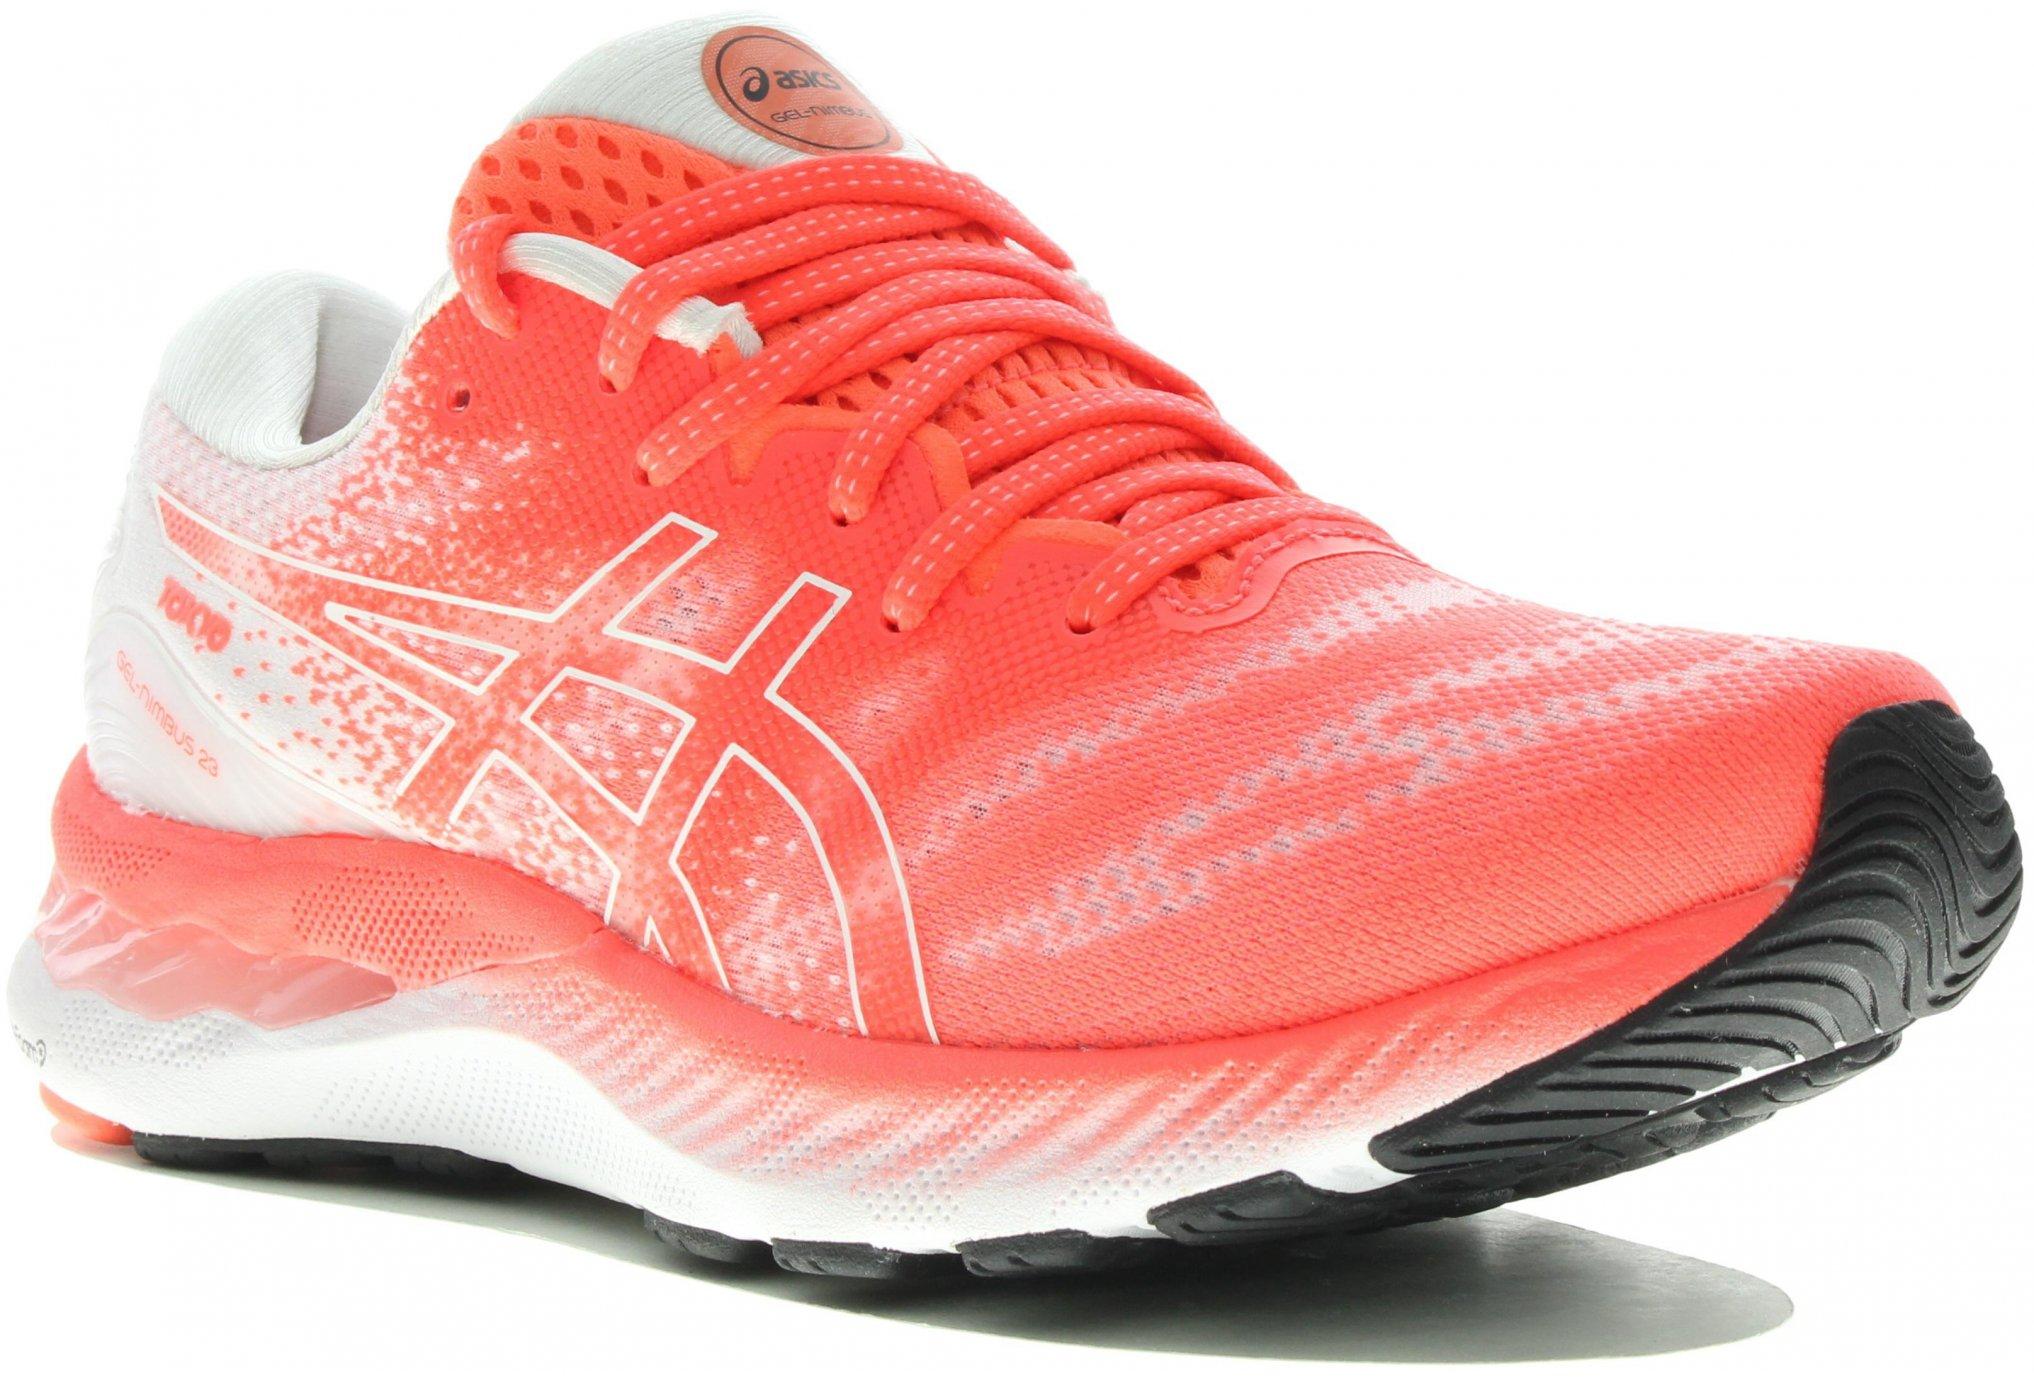 Asics Gel-Nimbus 23 Tokyo Chaussures running femme